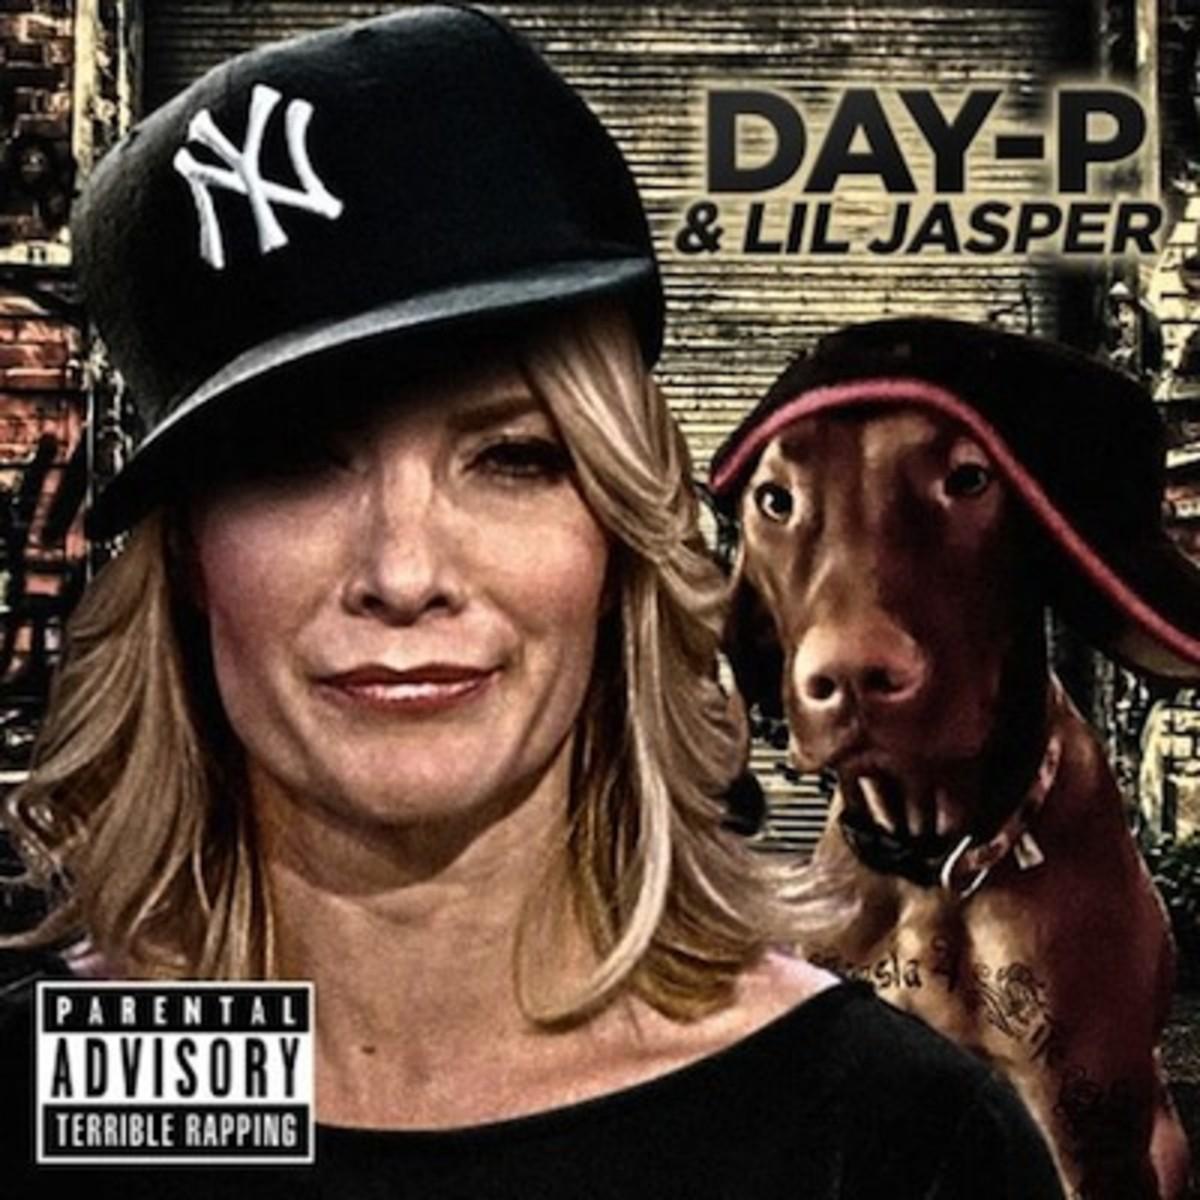 Dana Perino rap